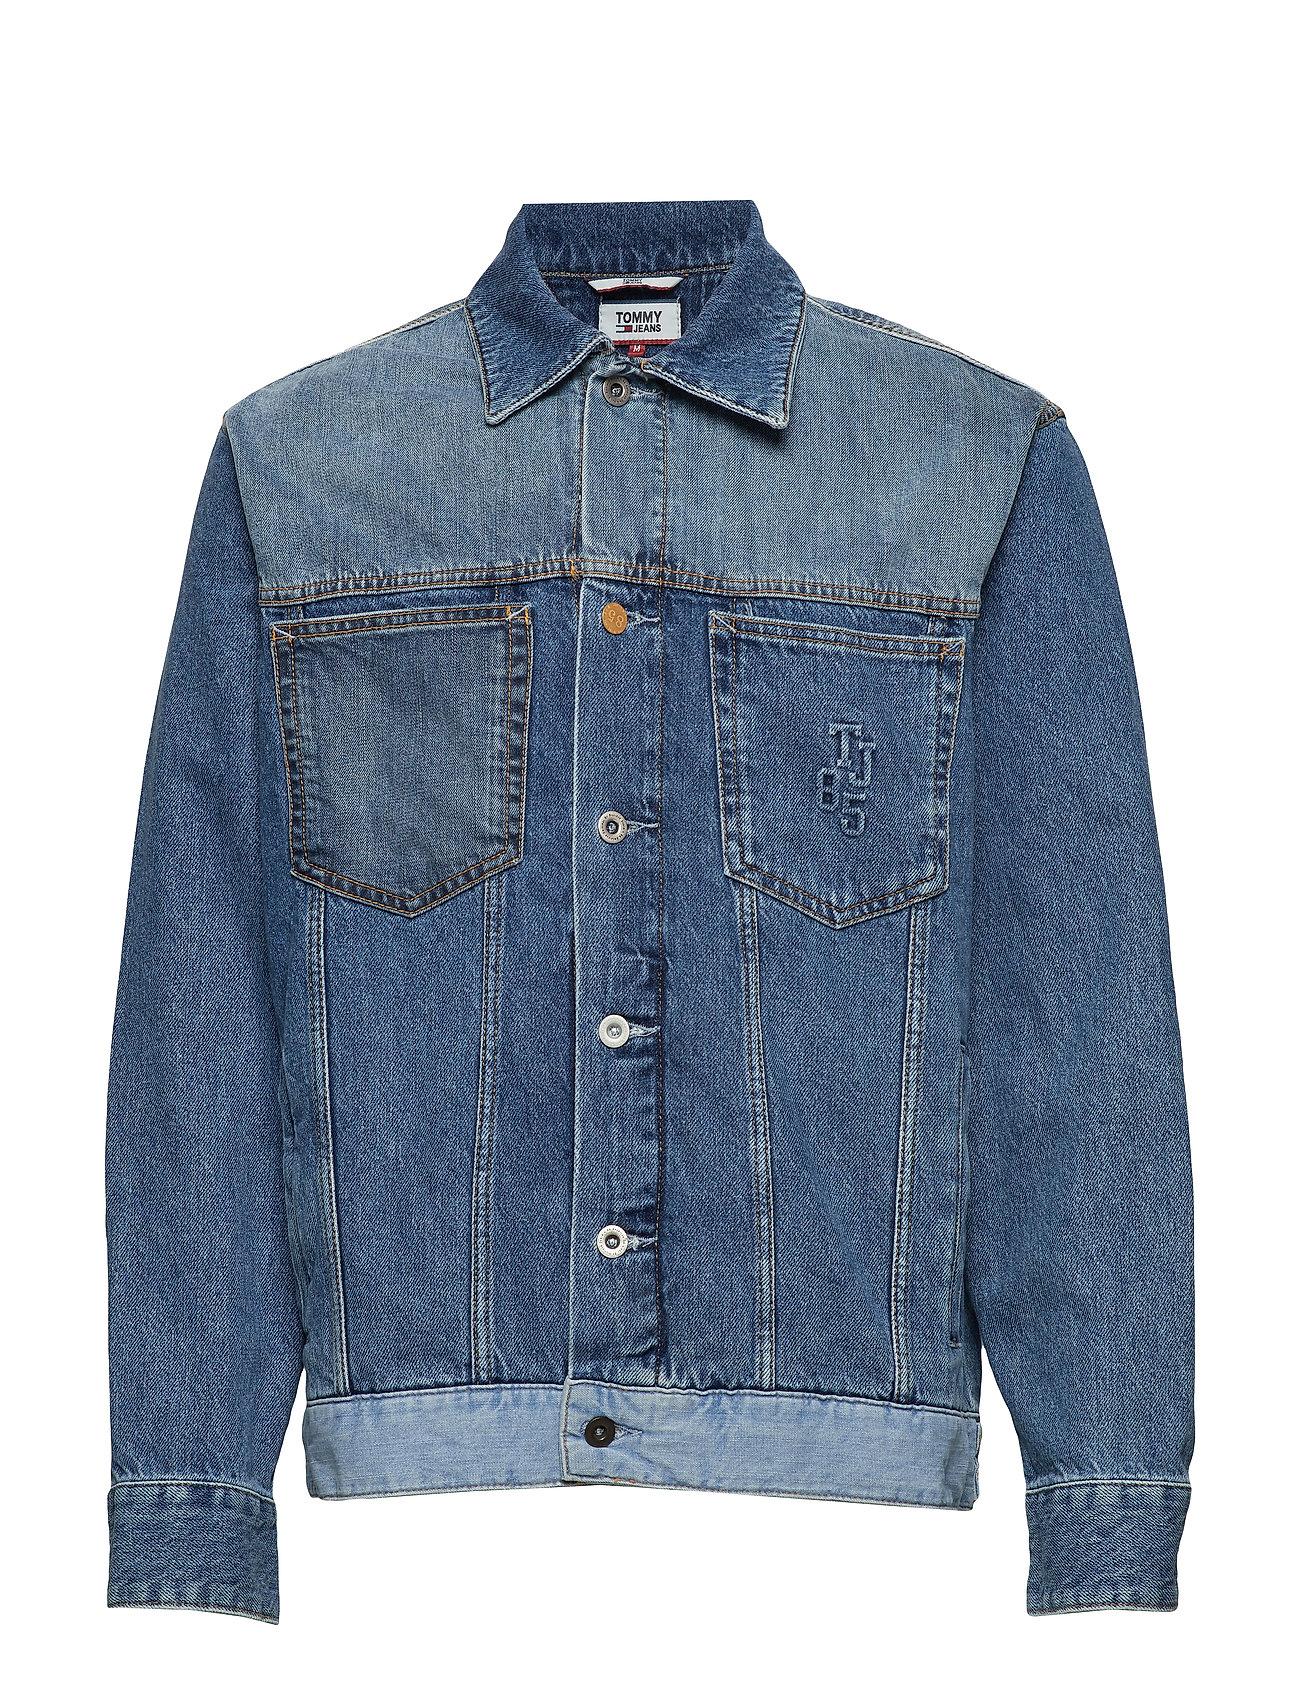 Tommy Jeans OVERSIZED TRUCKER JA - CARE MIX BL RIG